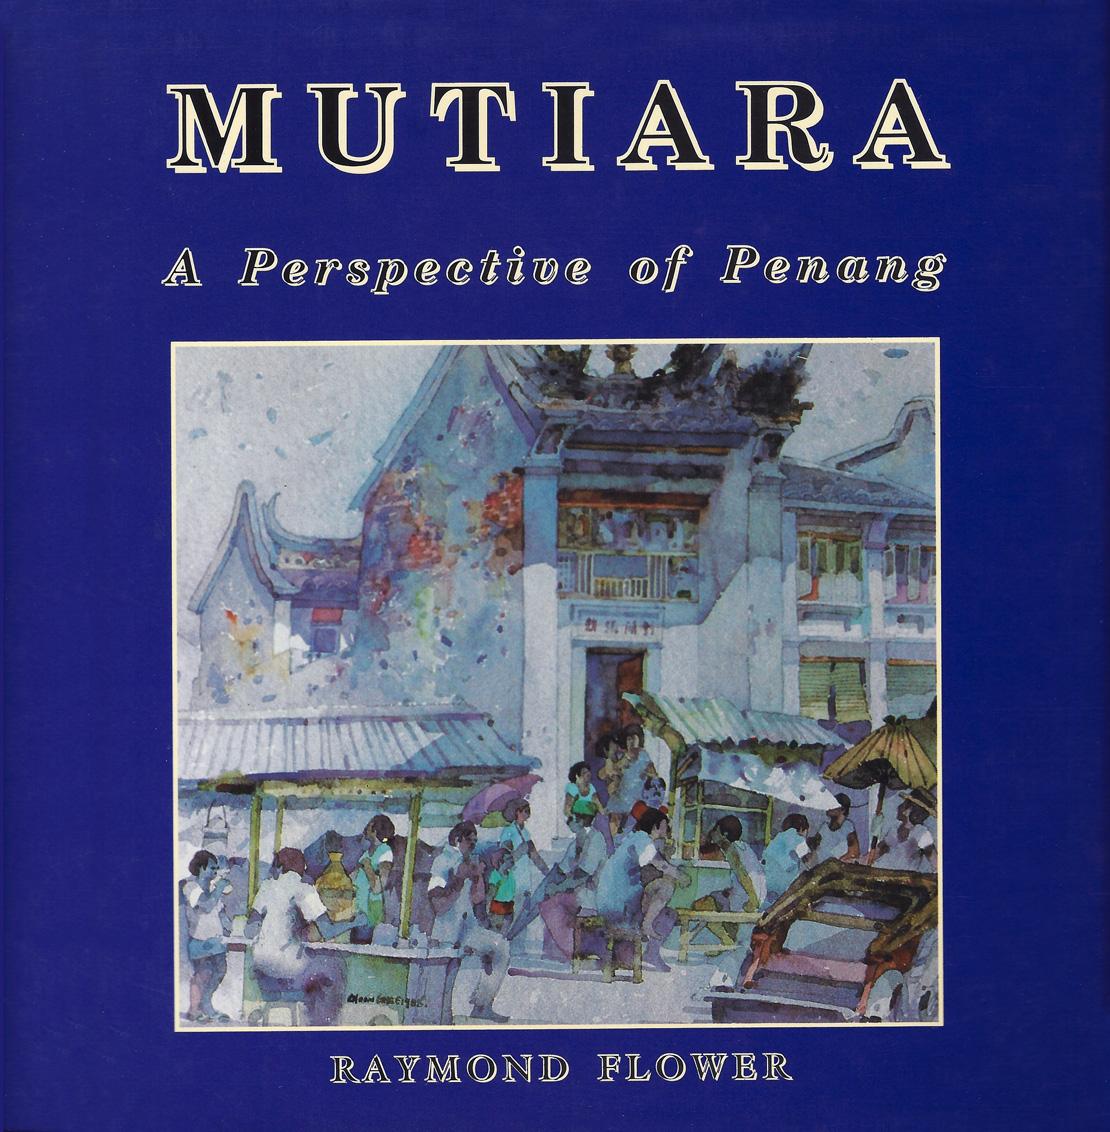 Mutiara — A Perspective of Penang